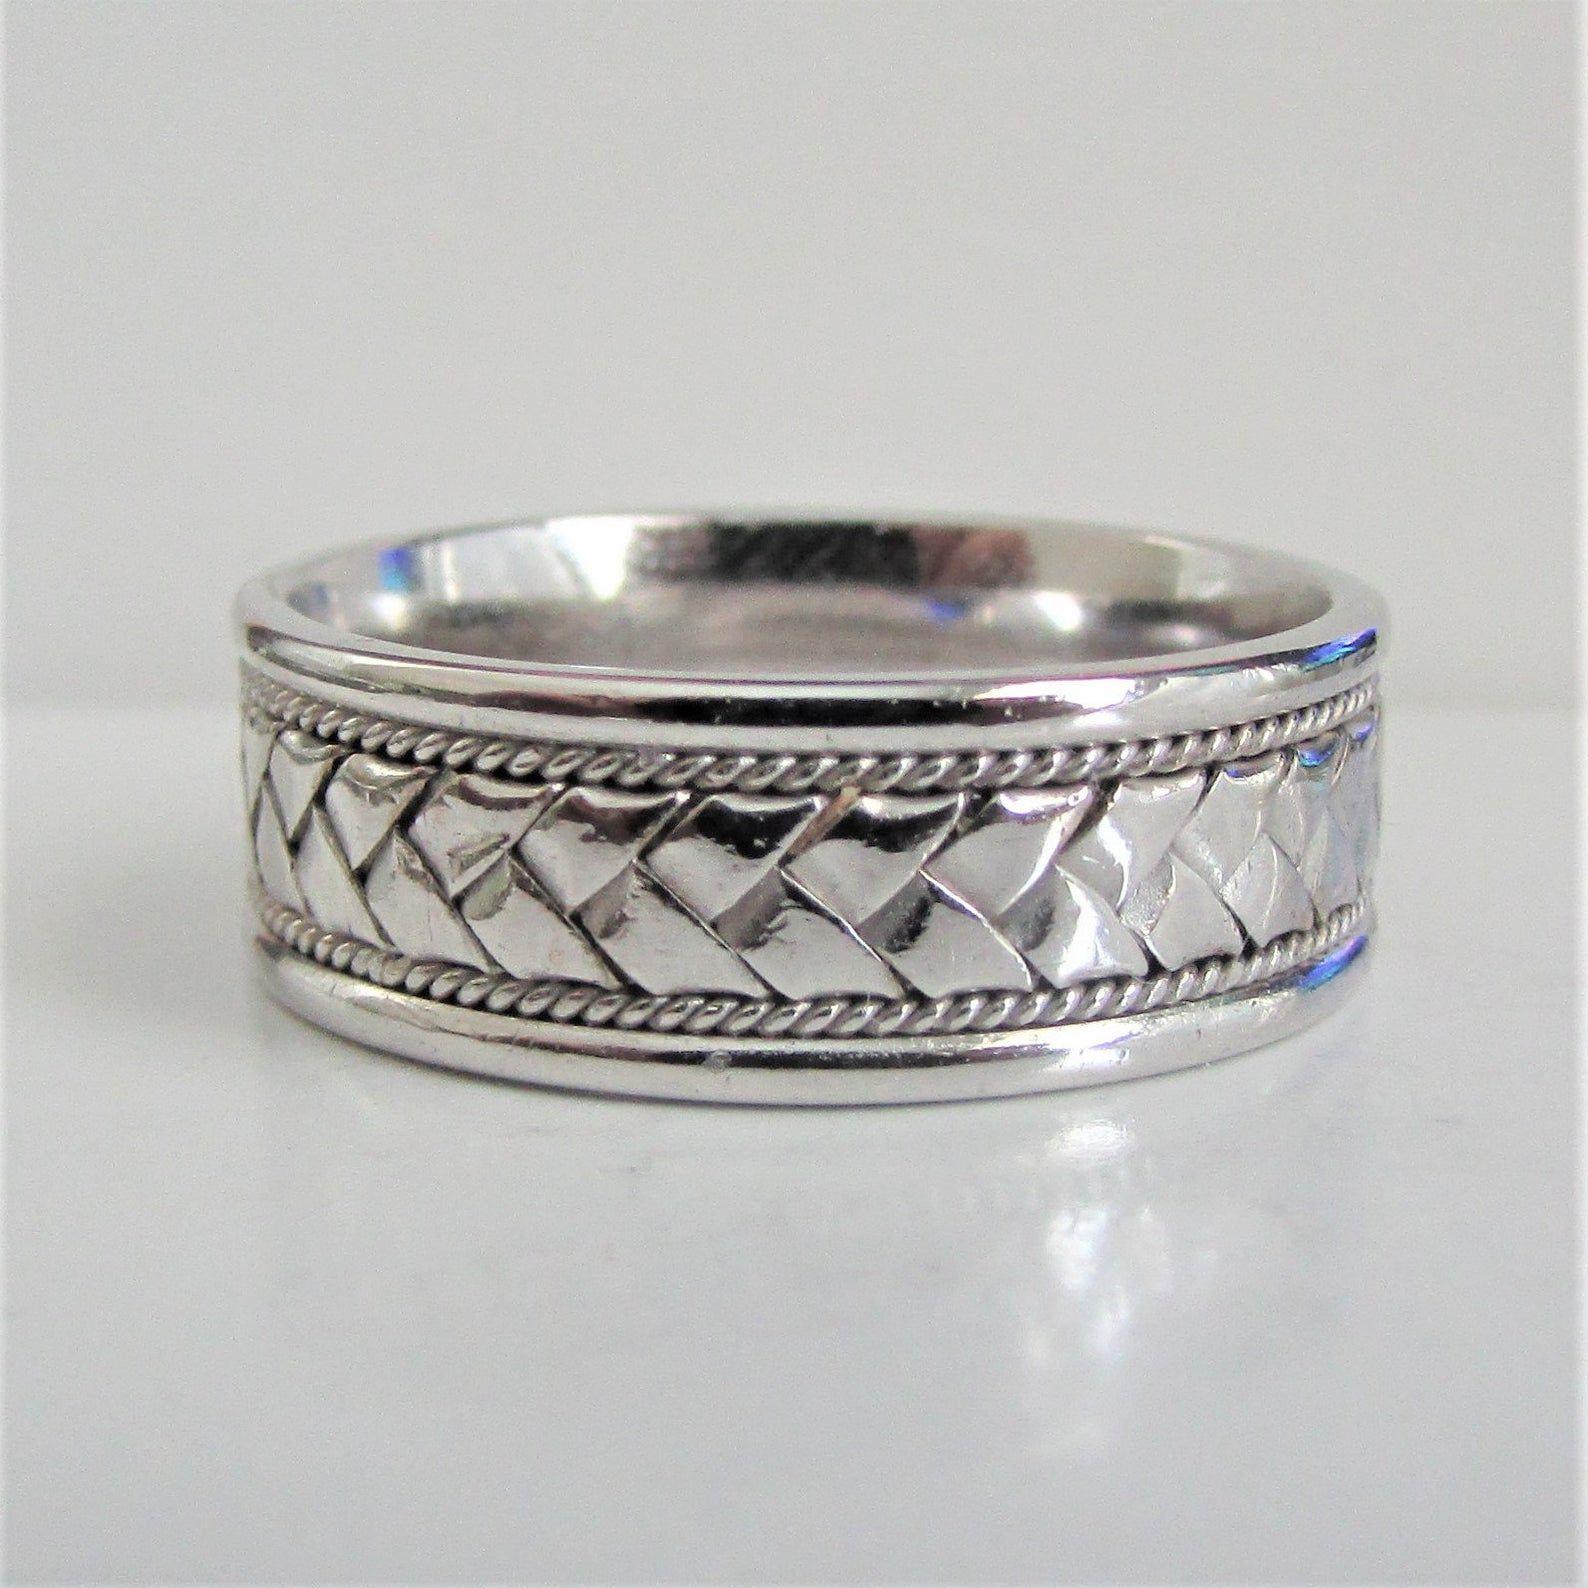 Mens 14k White Gold Braided Wedding Band Ring Or Women S Image 0 Mens White Gold Rings Wedding Ring Bands Mens Wedding Bands White Gold